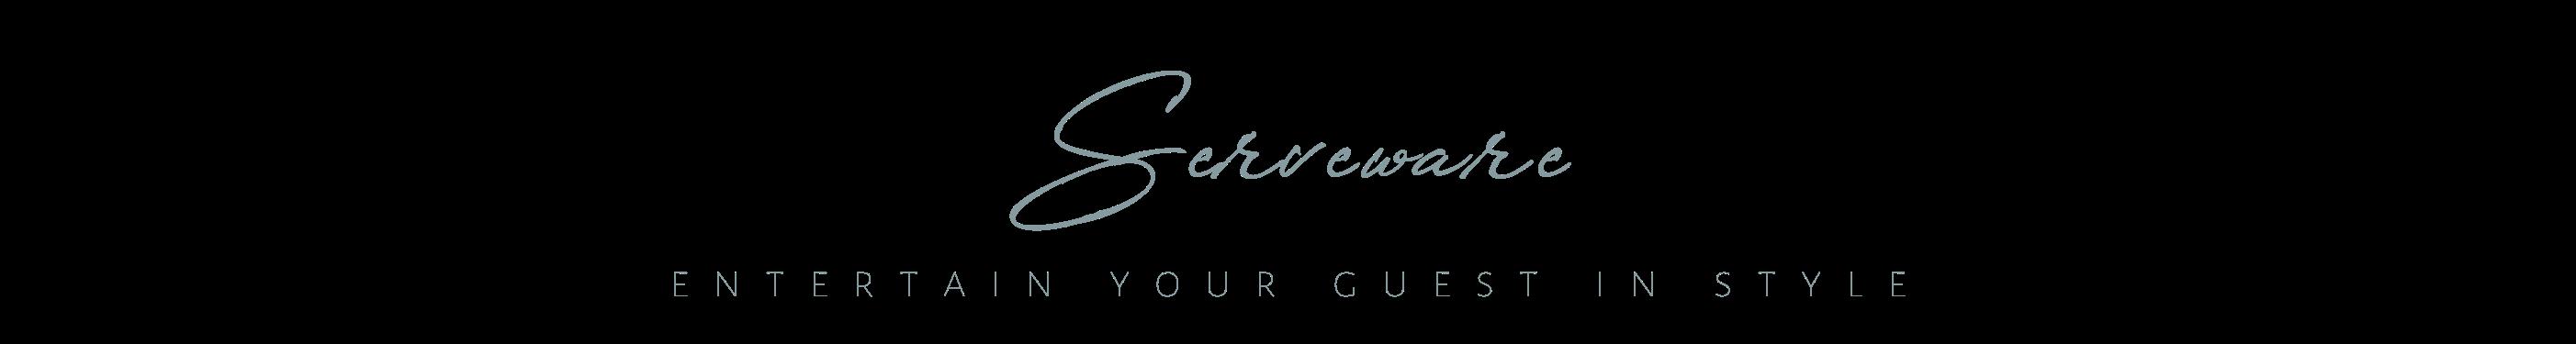 serveware-banner-.png